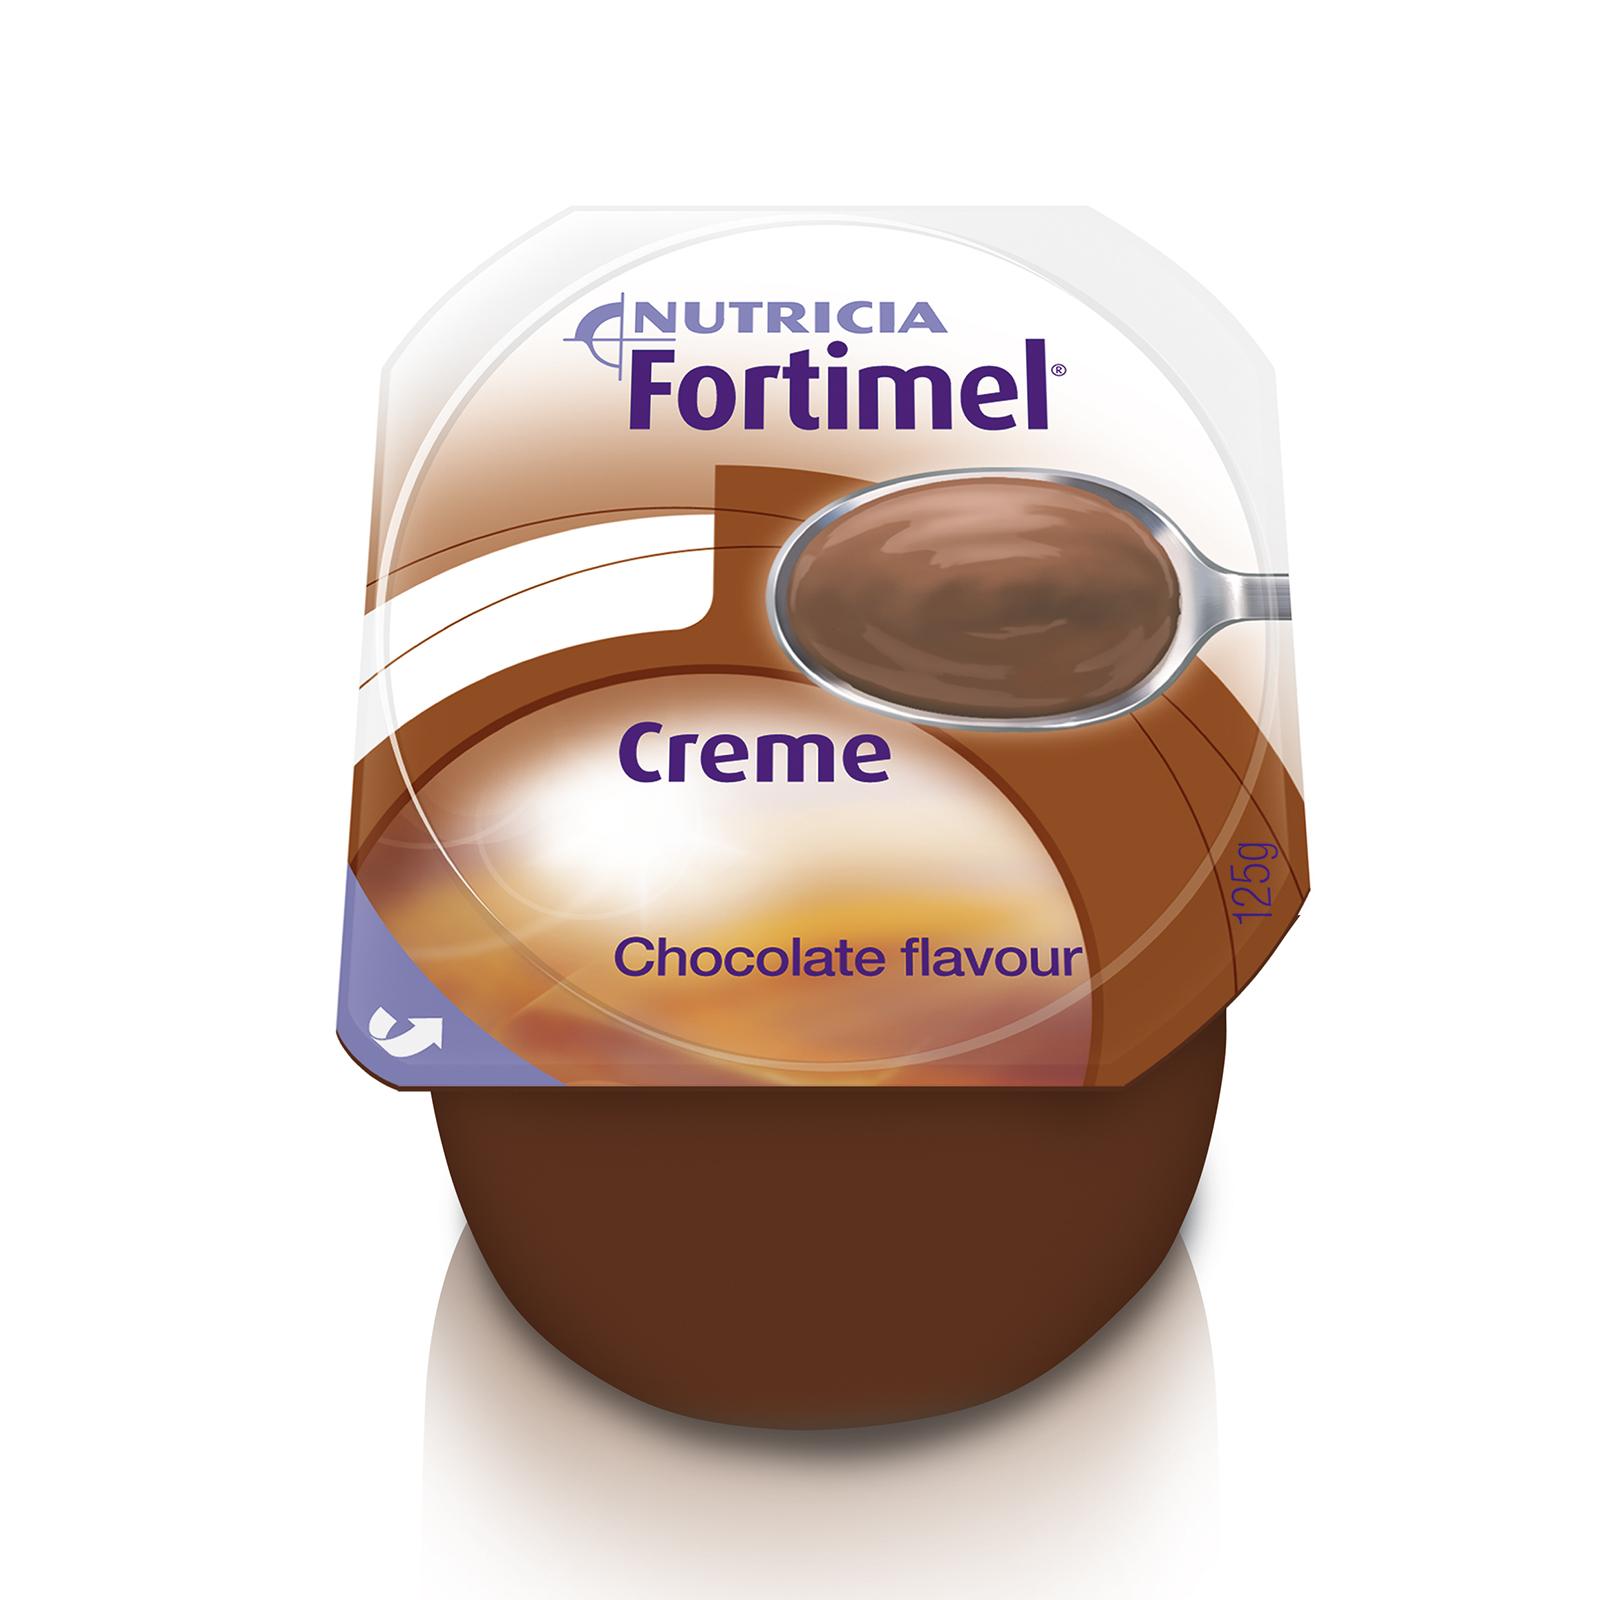 Fortimel Creme cioccolato 4x Vasetto 125 g | Nutricia